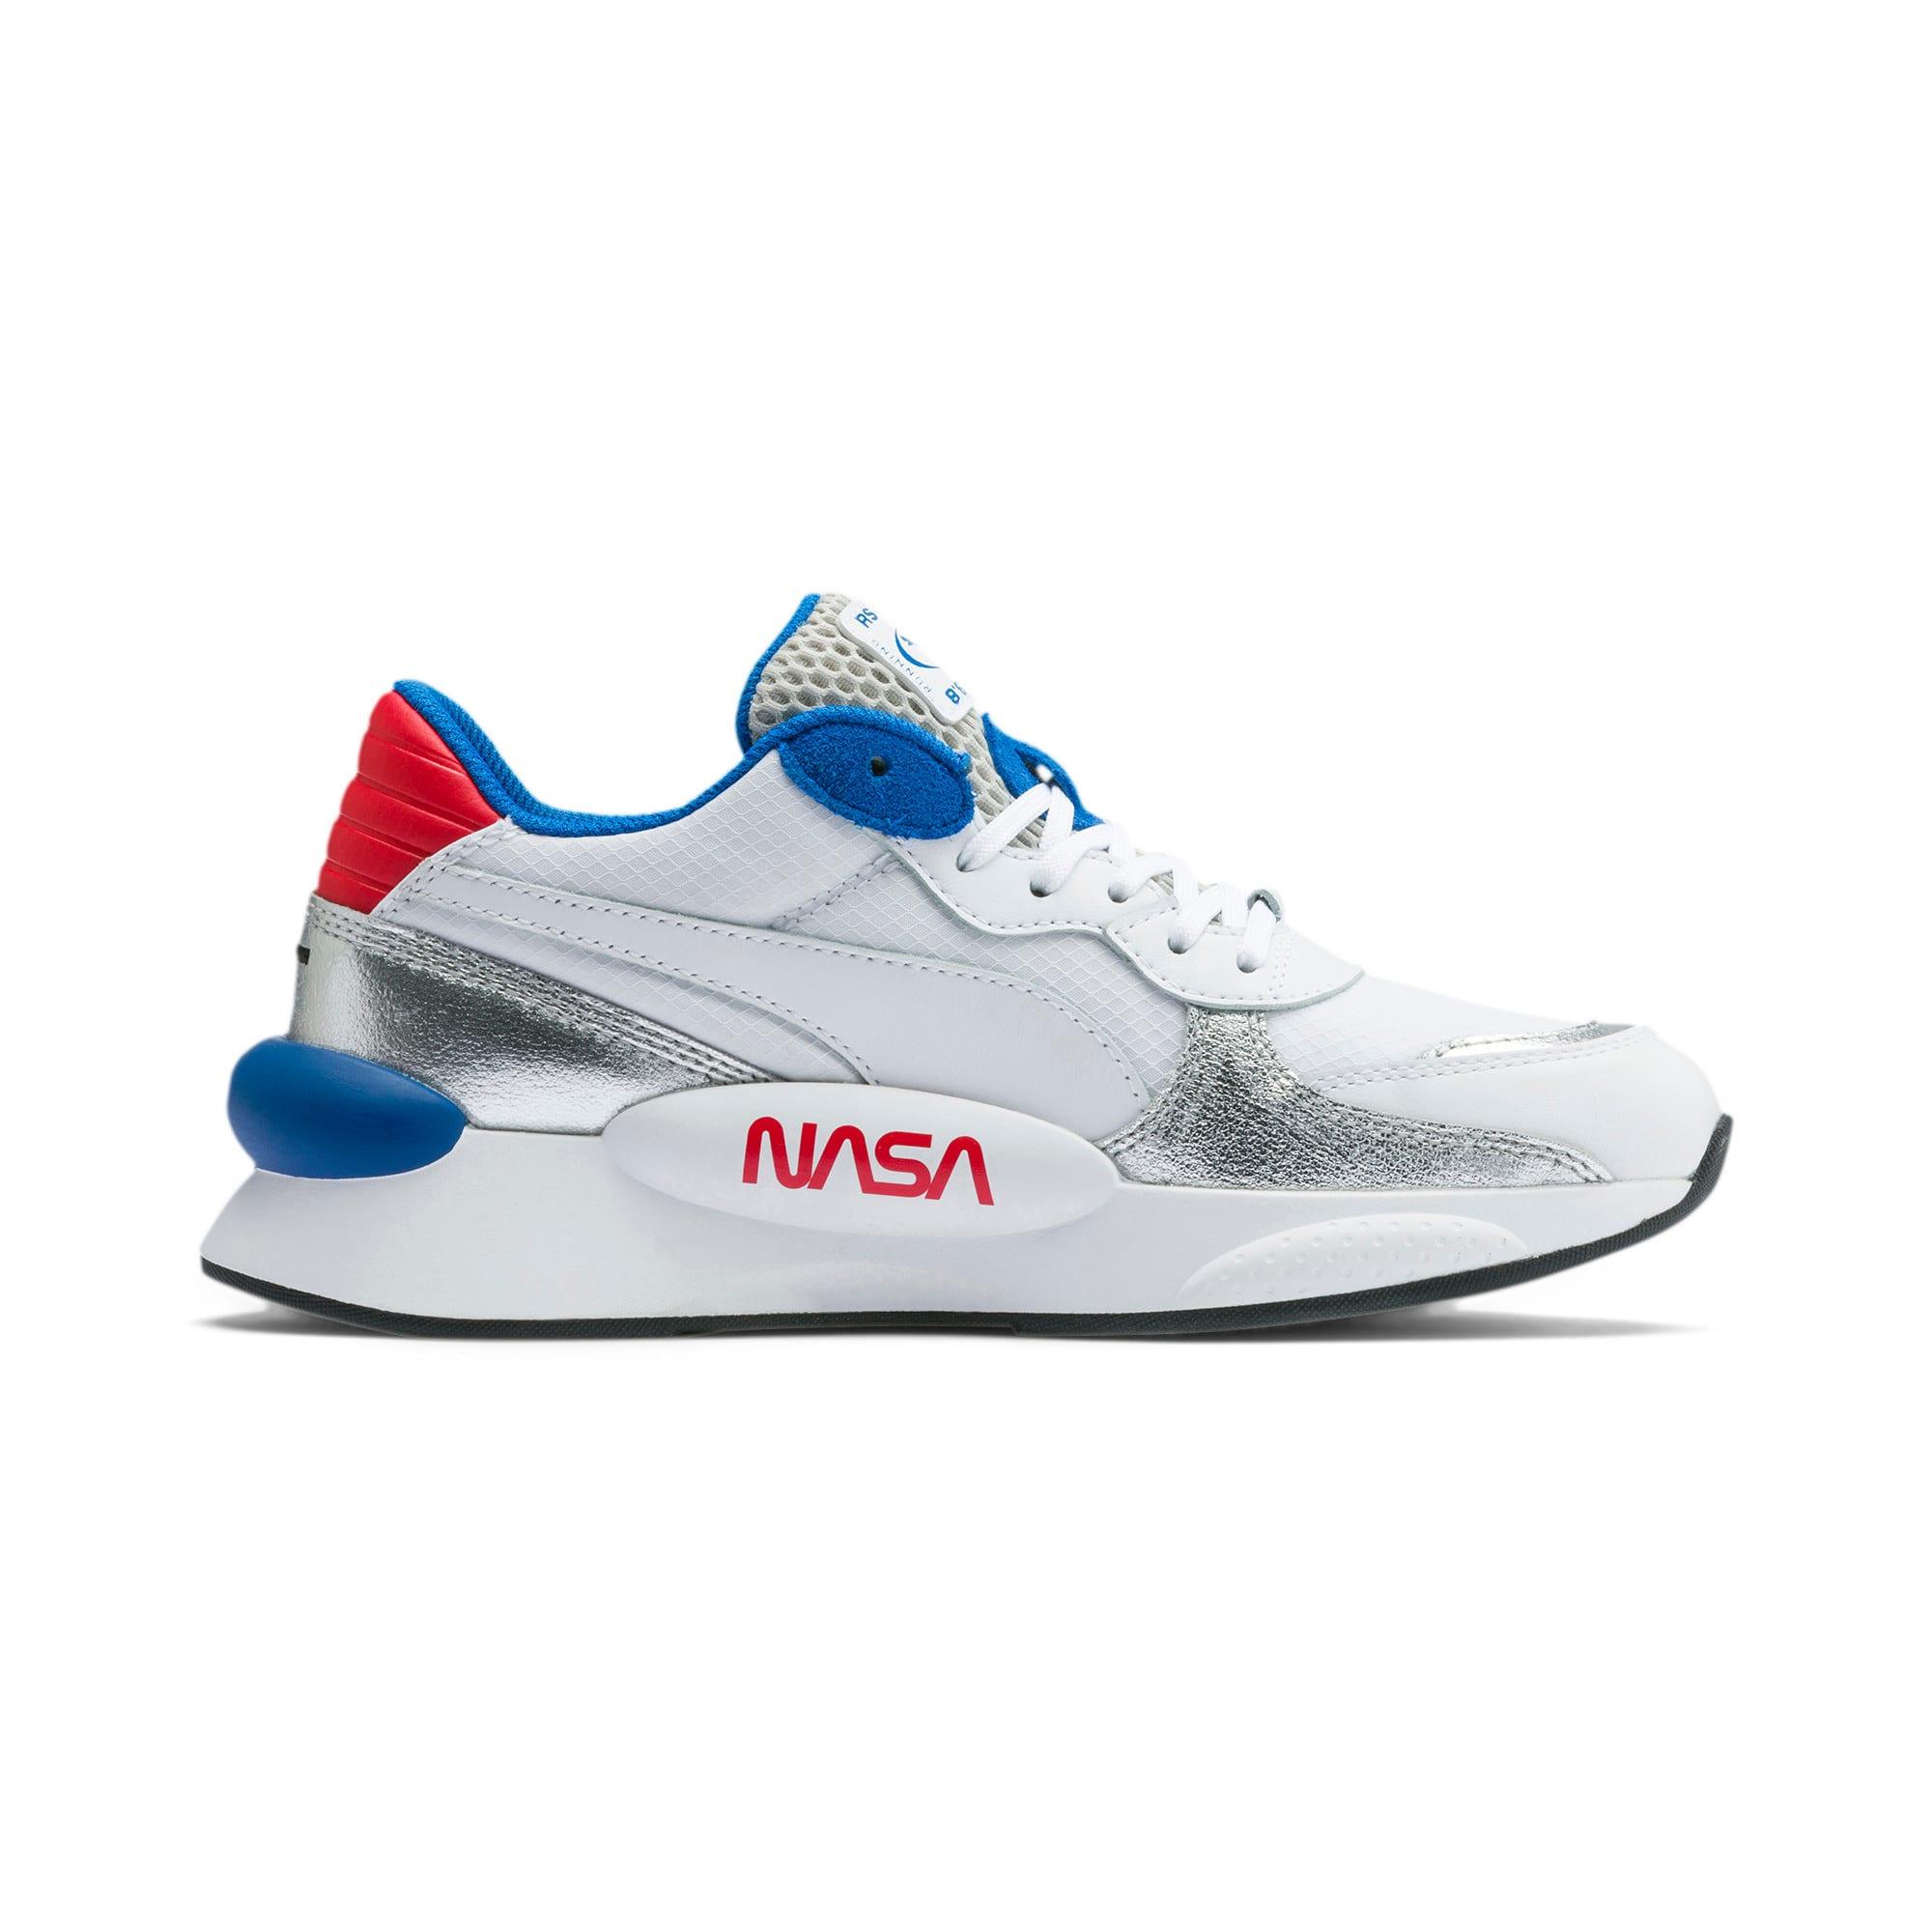 Thumbnail 5 of RS 9.8 Space Agency Sneakers JR, Puma White-Puma Silver, medium